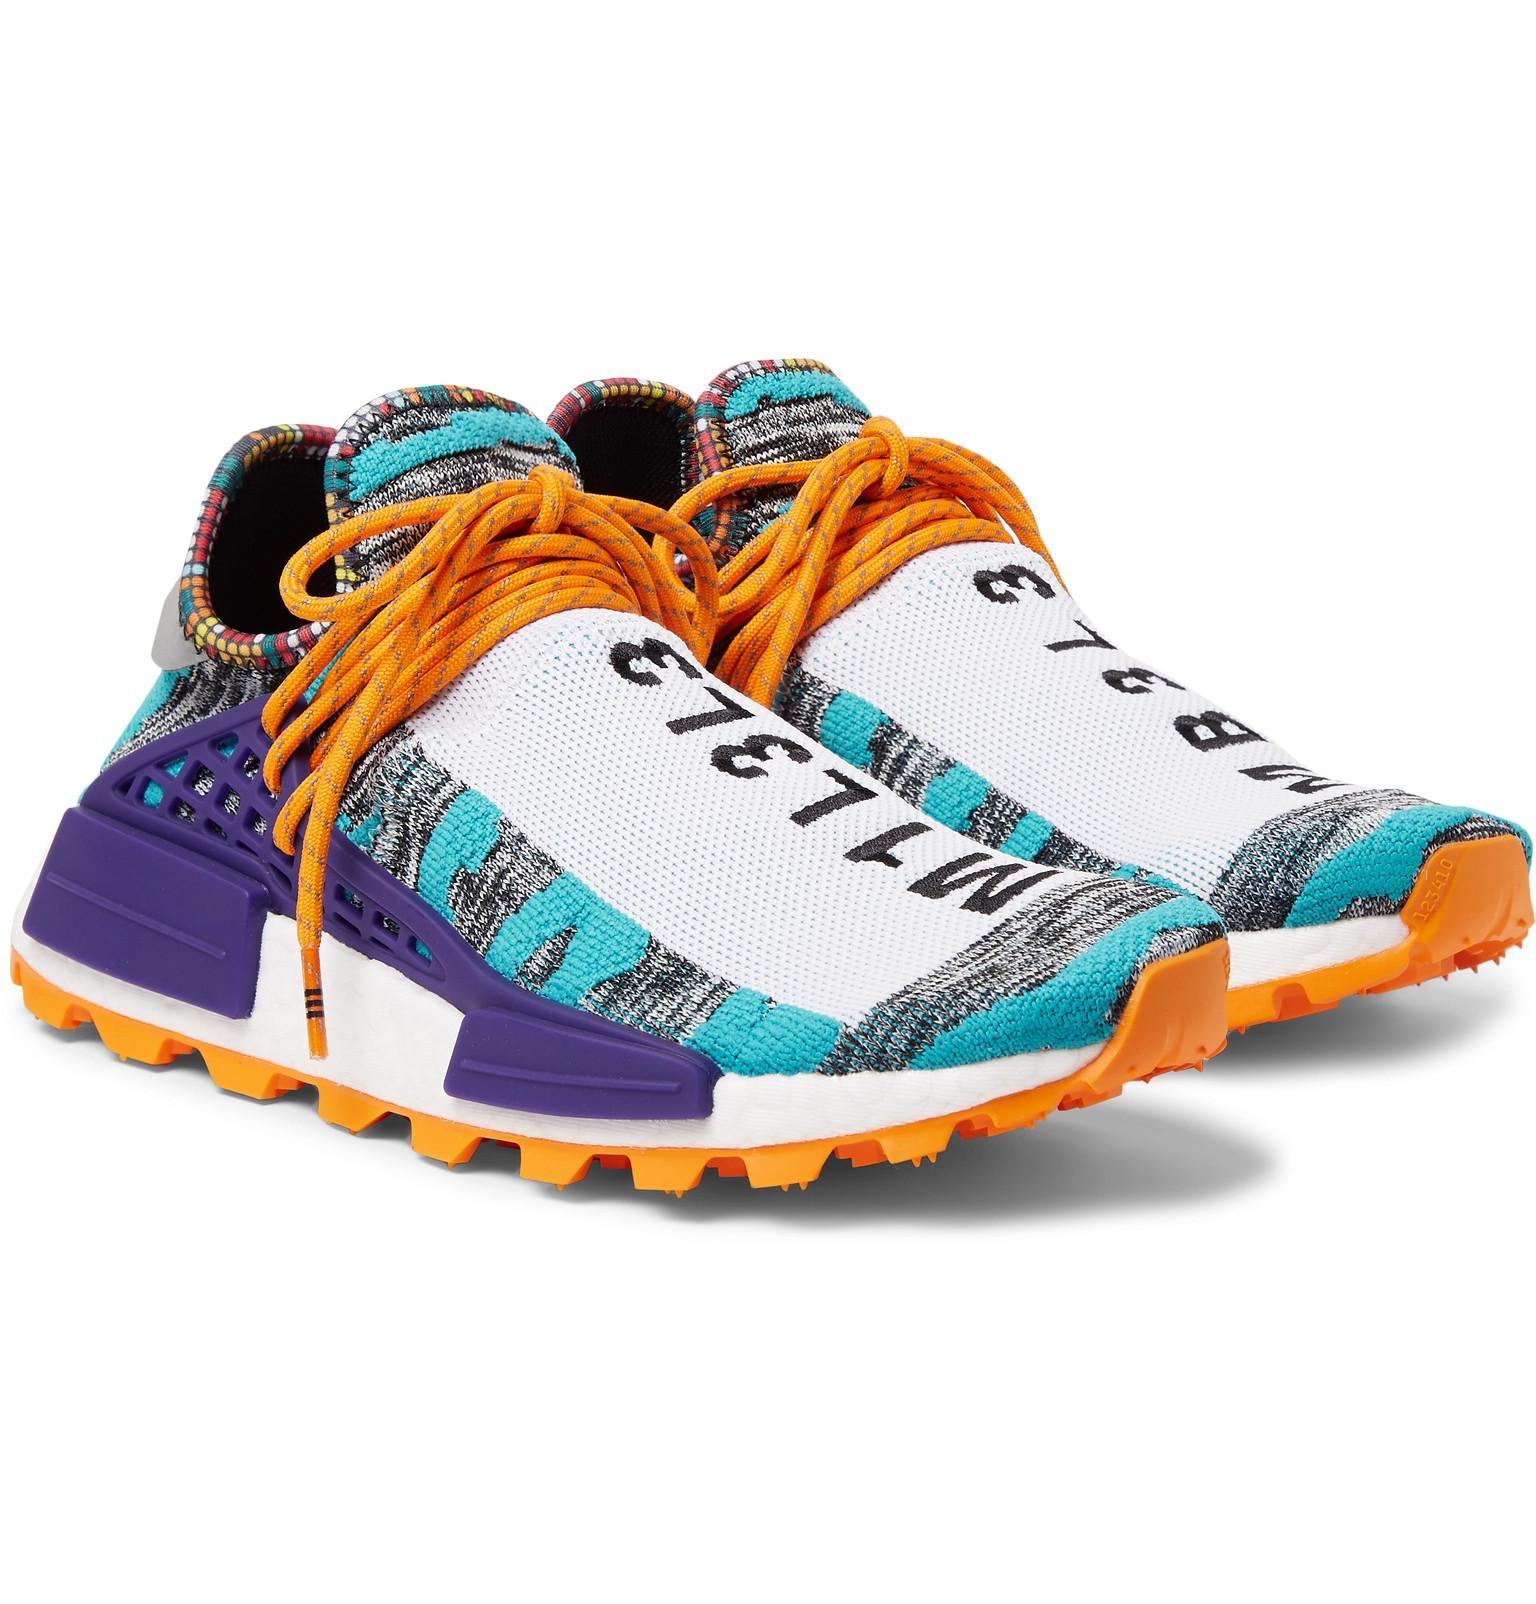 ac91d338431c0 adidas Originals + Pharrell Williams Solarhu Nmd Primeknit Sneakers ...